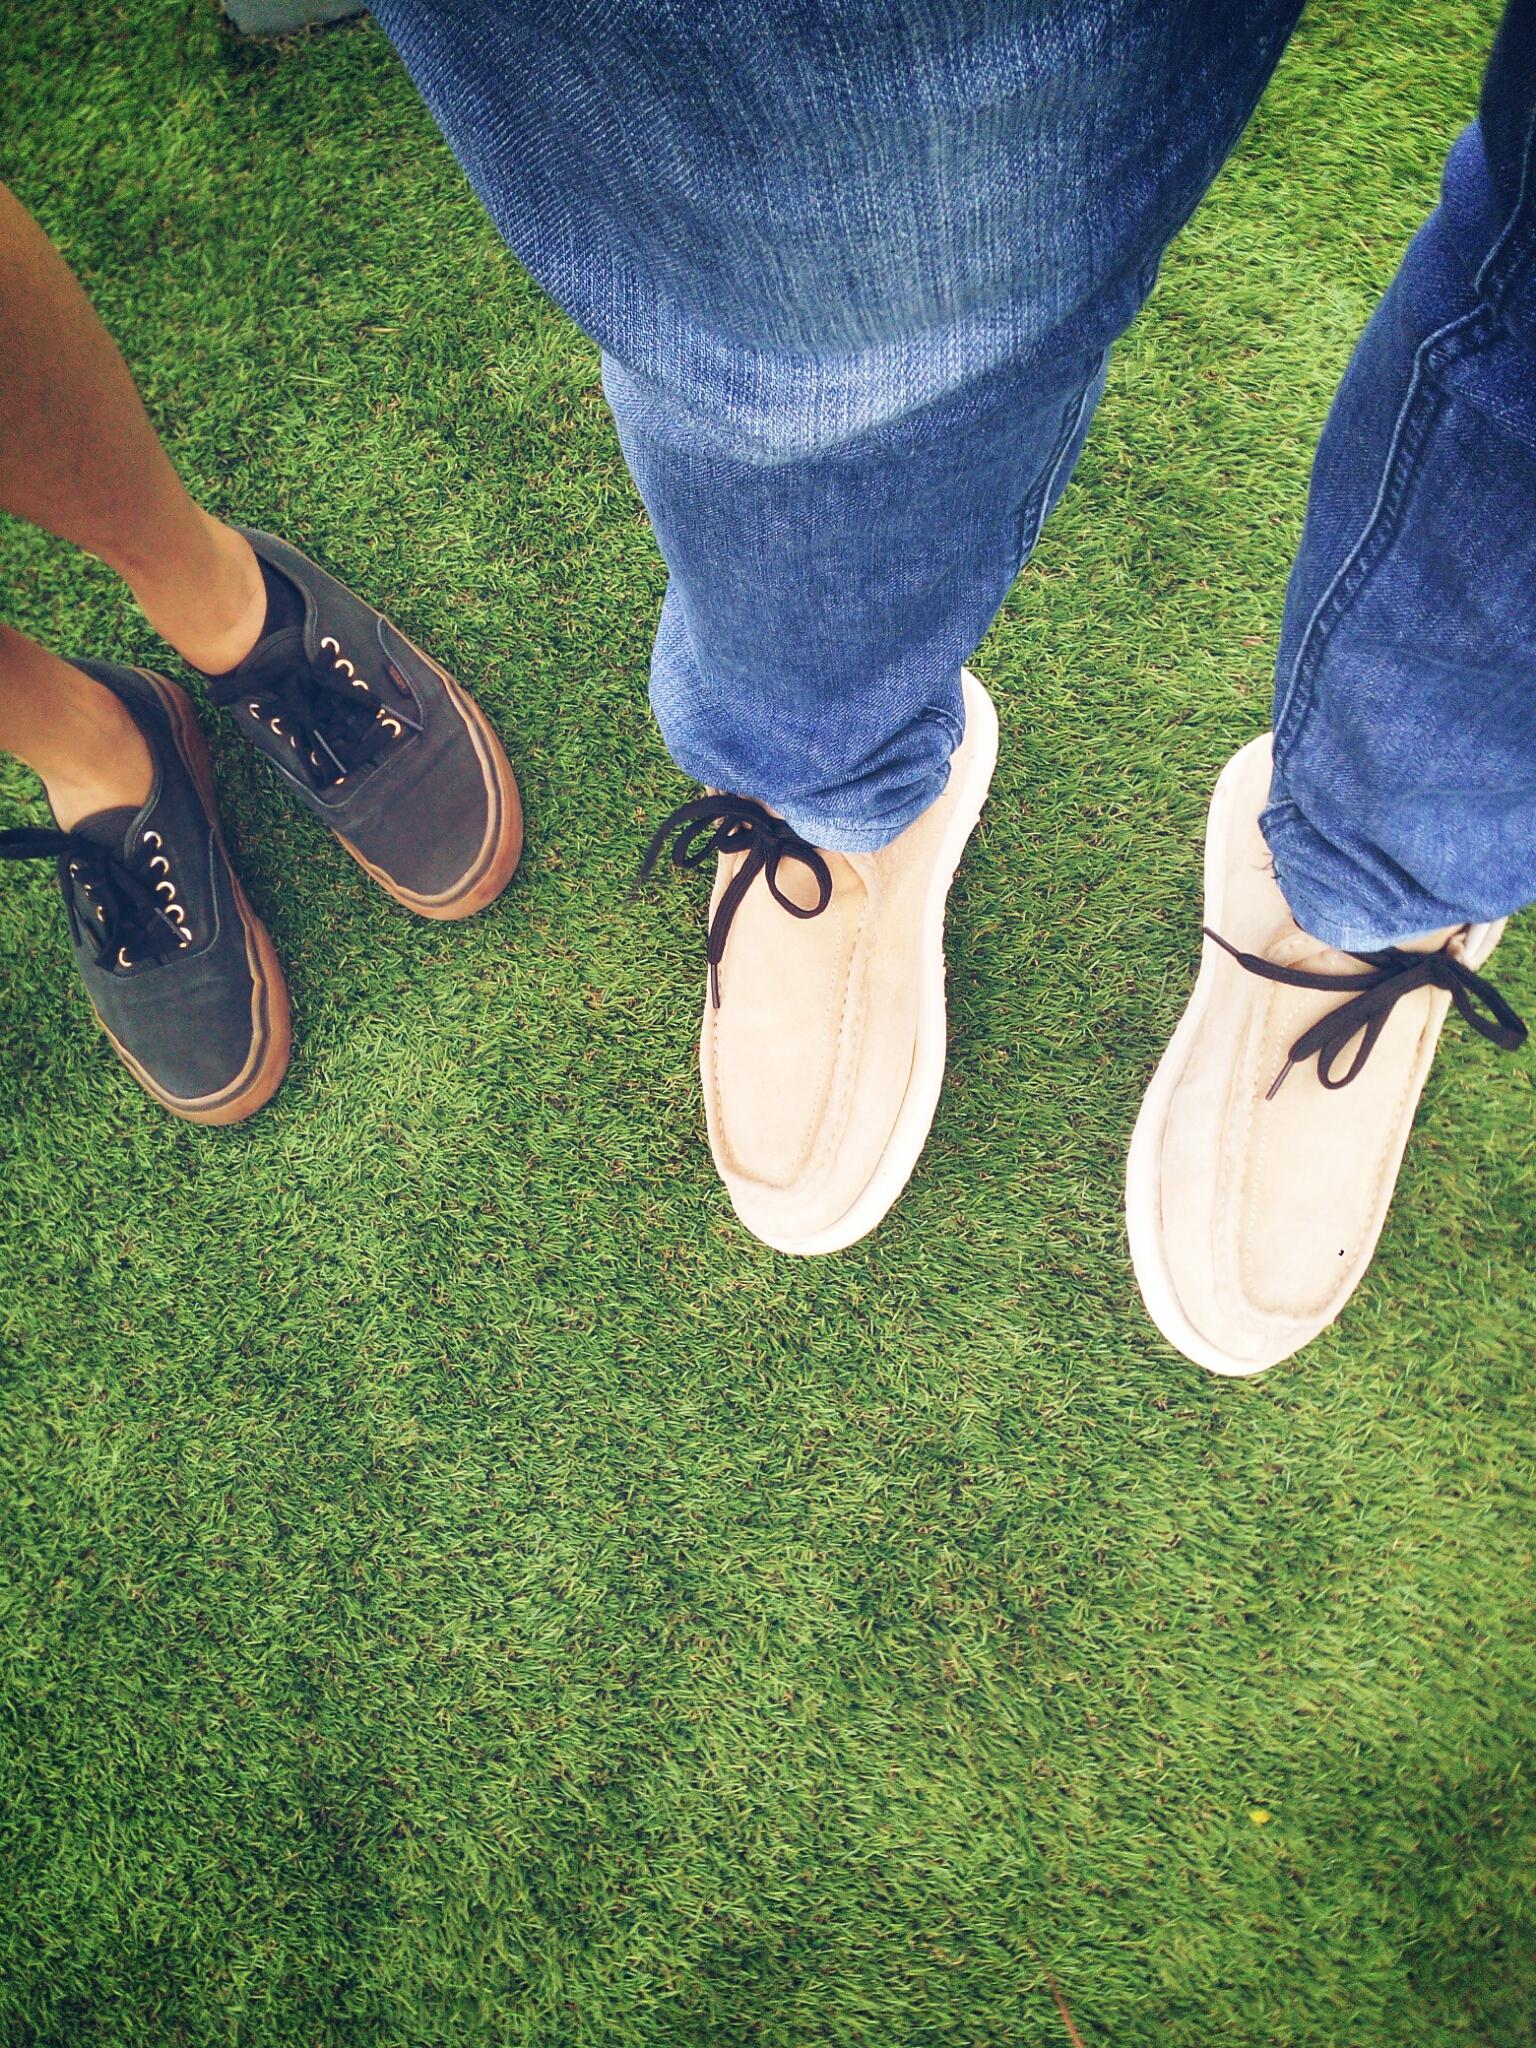 Grass, Shoes.